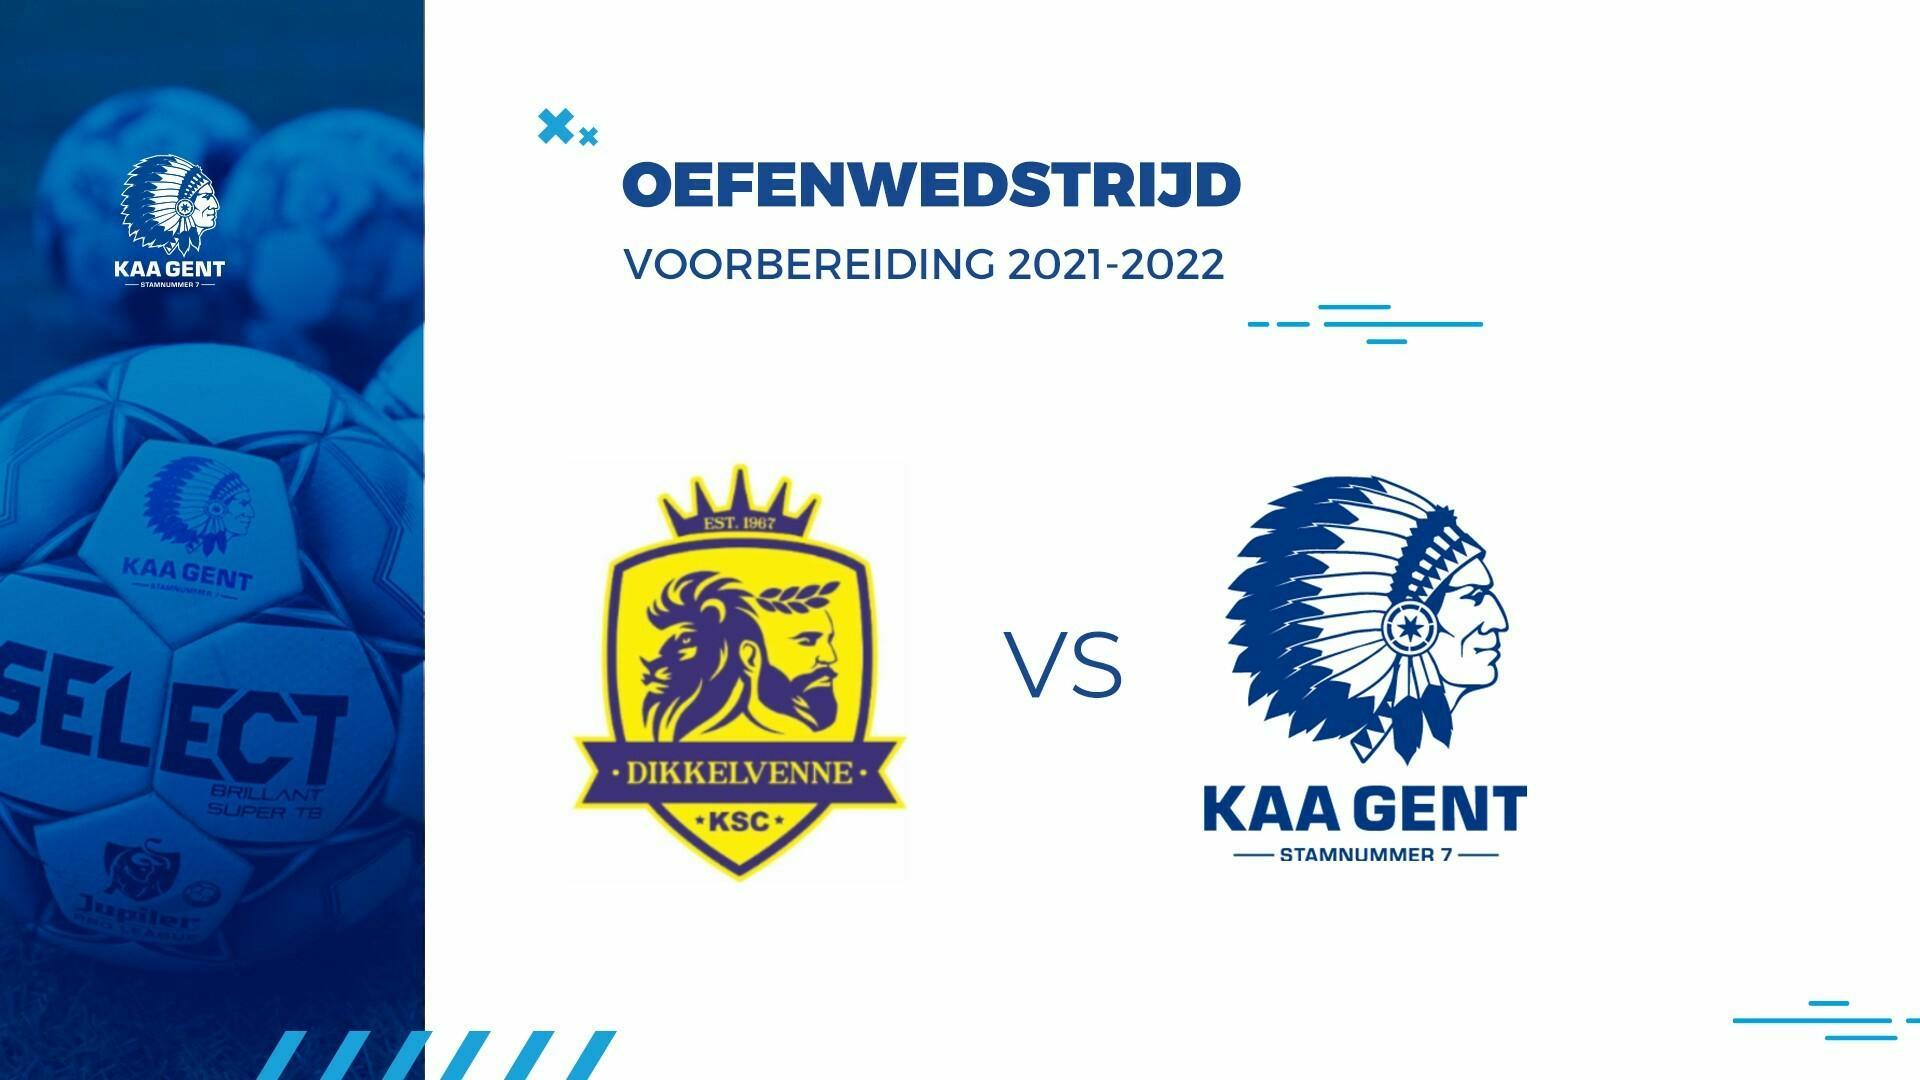 Livestream oefenwedstrijd Dikkelvenne - KAA Gent